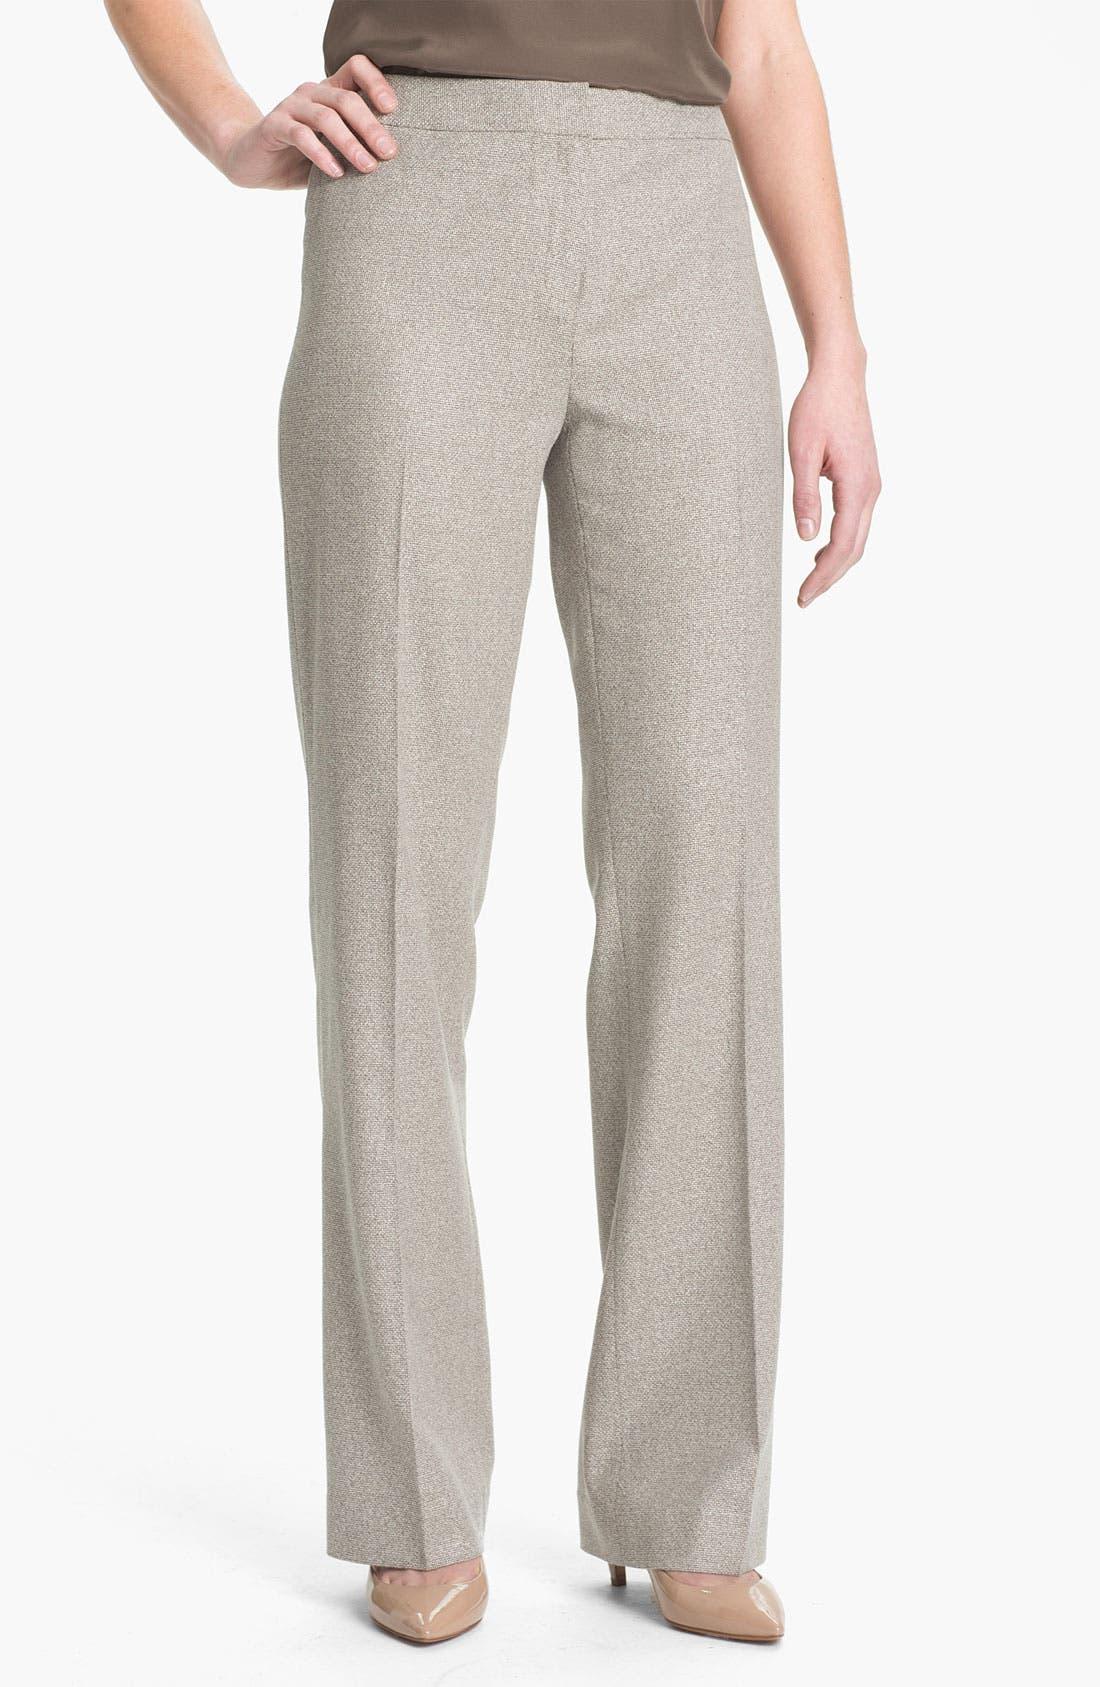 Alternate Image 1 Selected - Lafayette 148 New York Menswear Suiting Pants